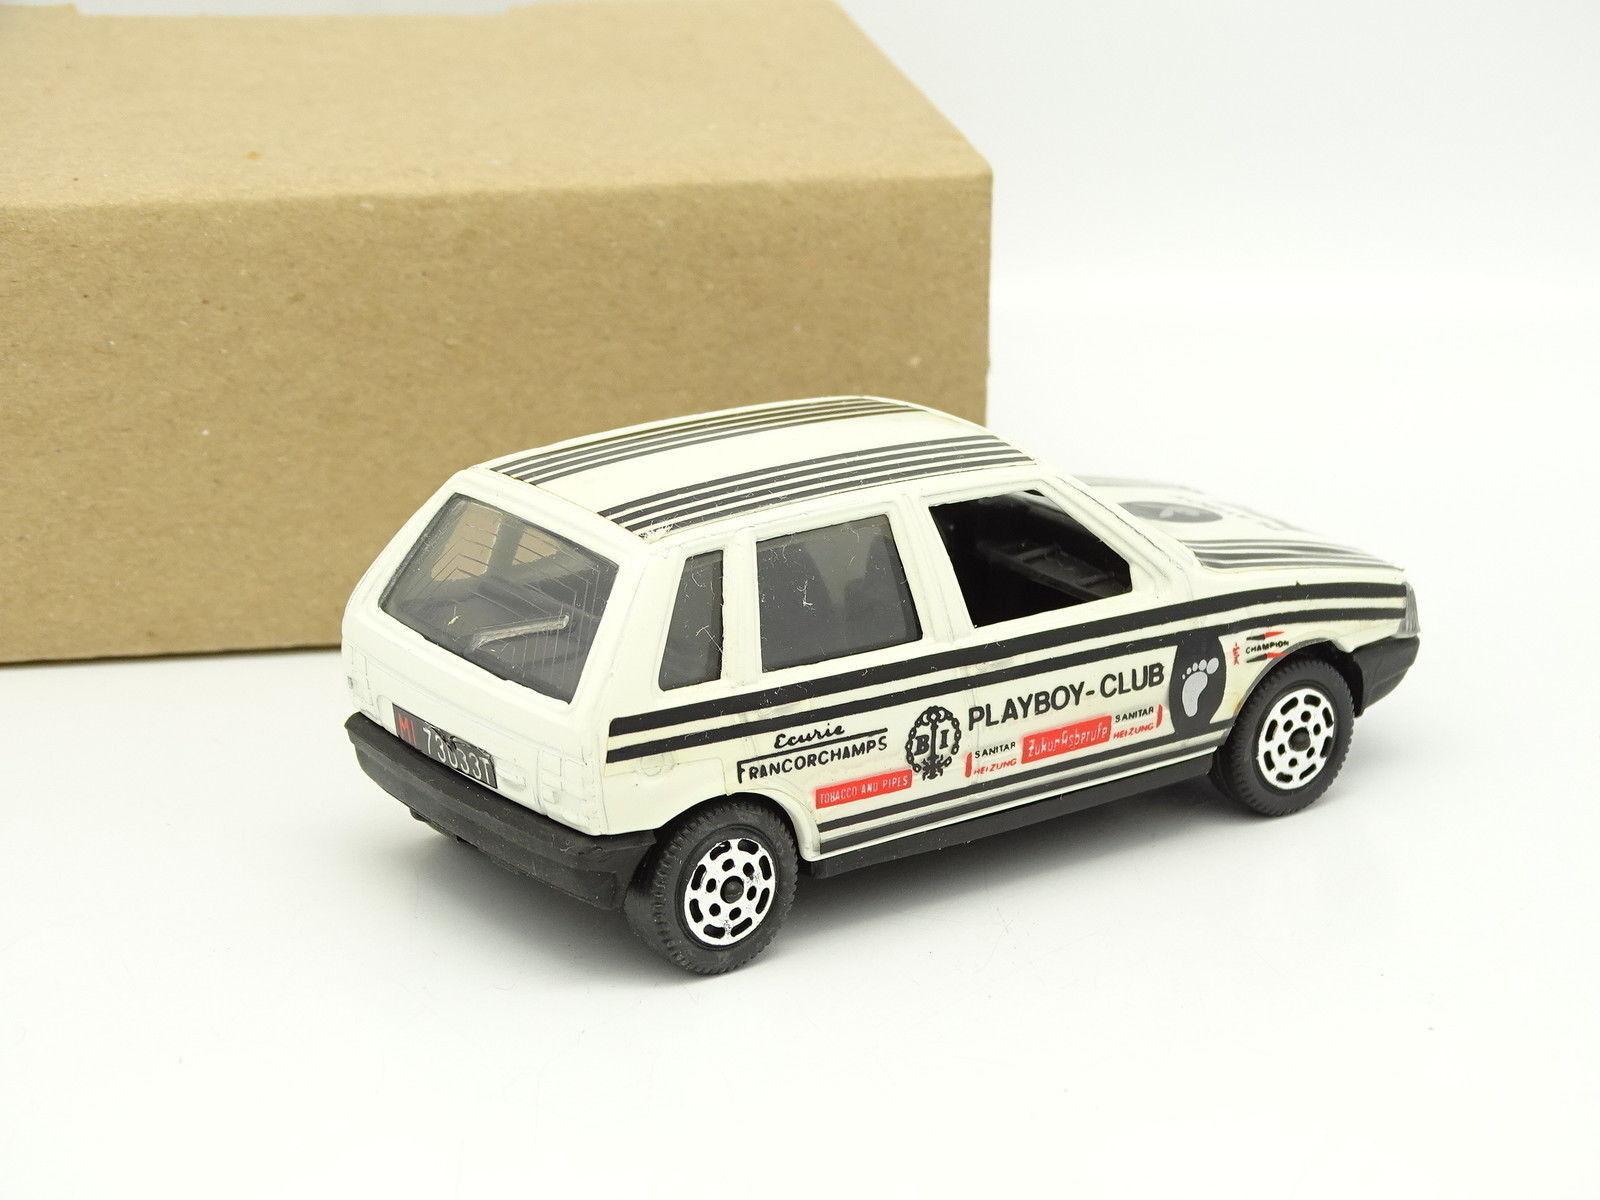 Großartig Räder Mebetoys SB 1 1 1 43 - Fiat Uno Playboy 6baae0